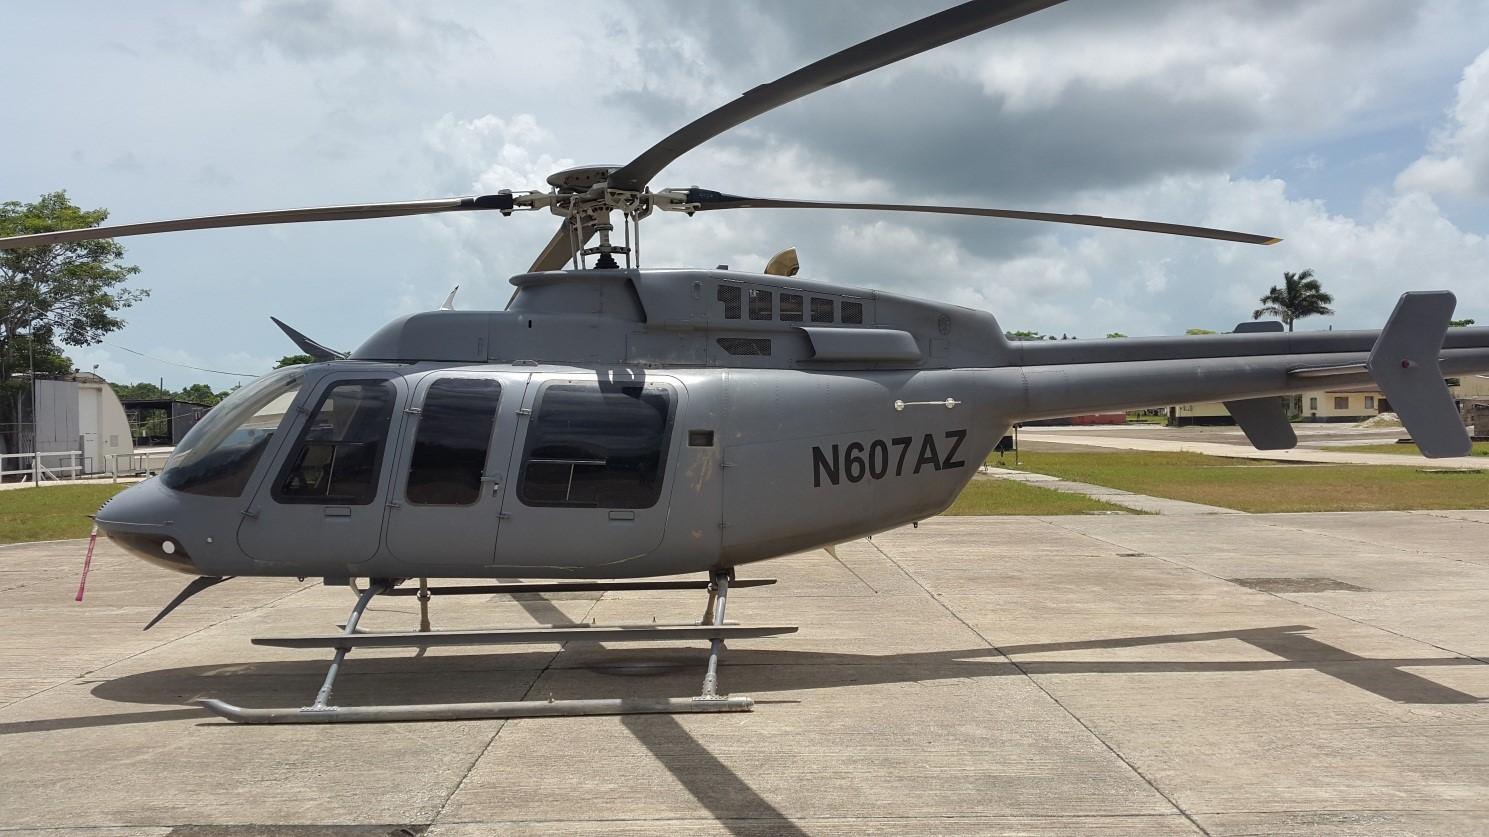 Elicottero Grigio : Authorities in orange walk find abandoned helicopter